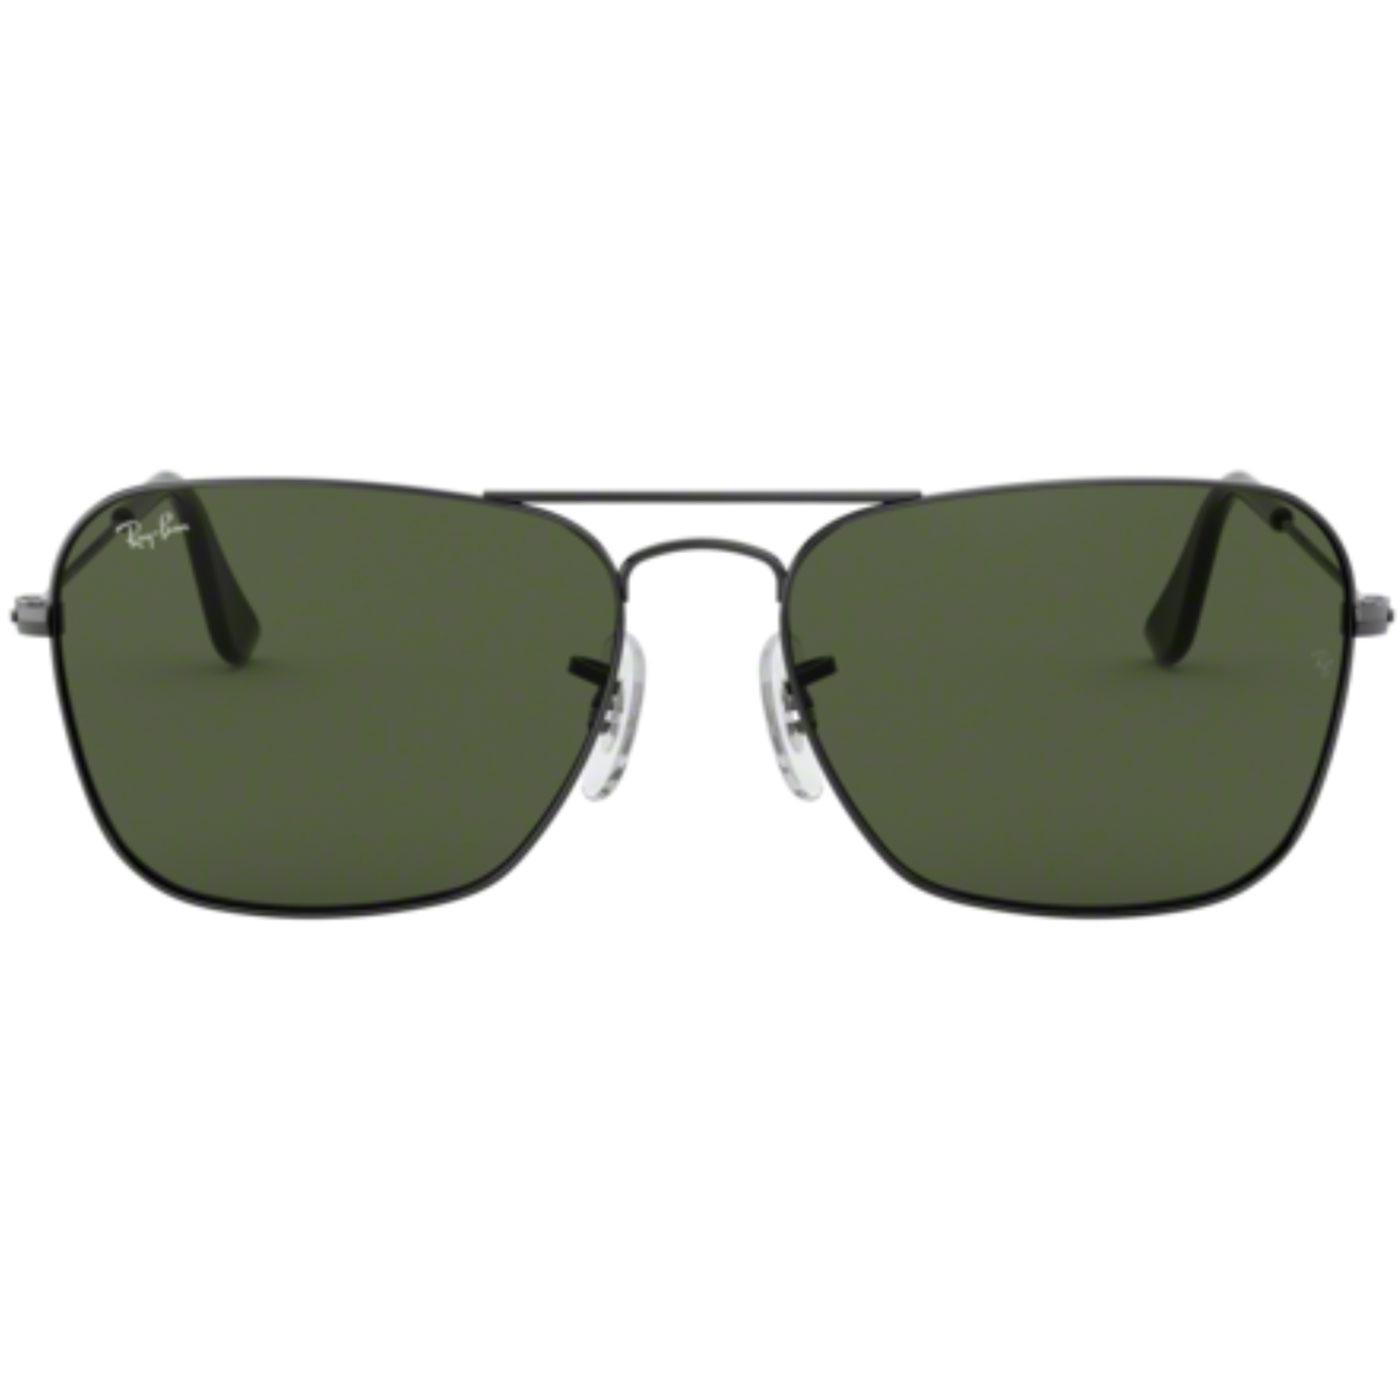 Ray-Ban Caravan Retro G-15 Lens Sunglasses 0RB3136